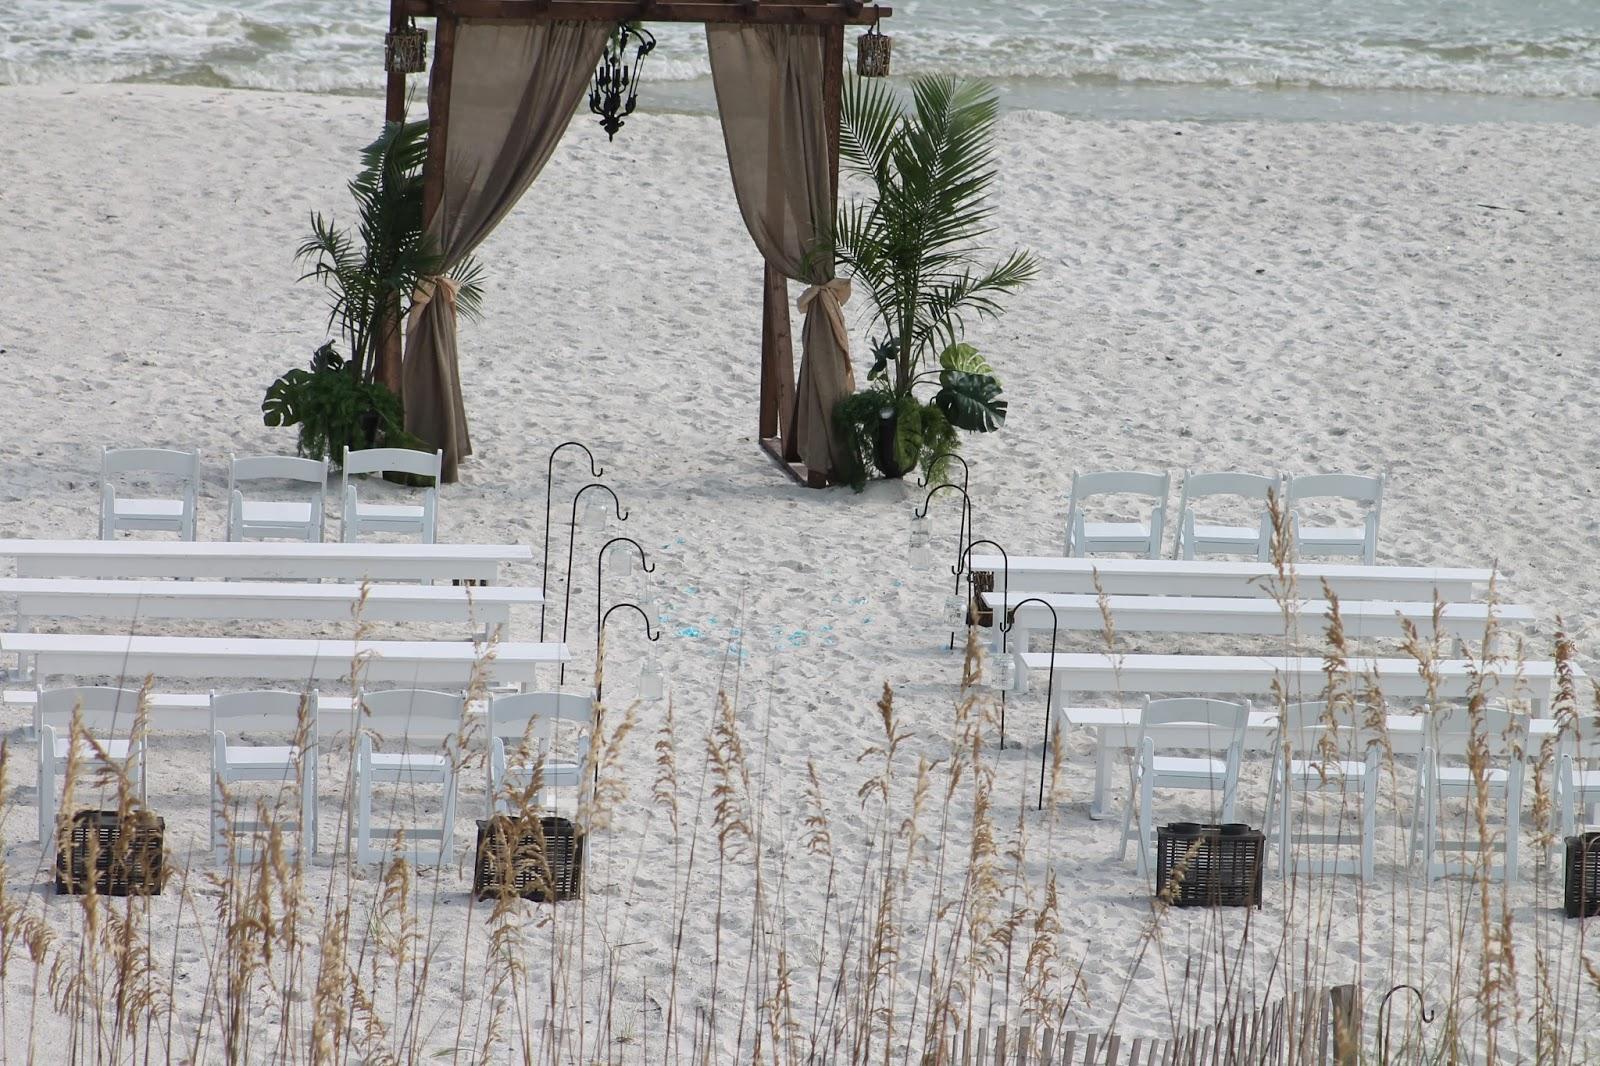 Matrimonio Simbolico De La Arena : Quién dijo boda la ceremonia de arena ii